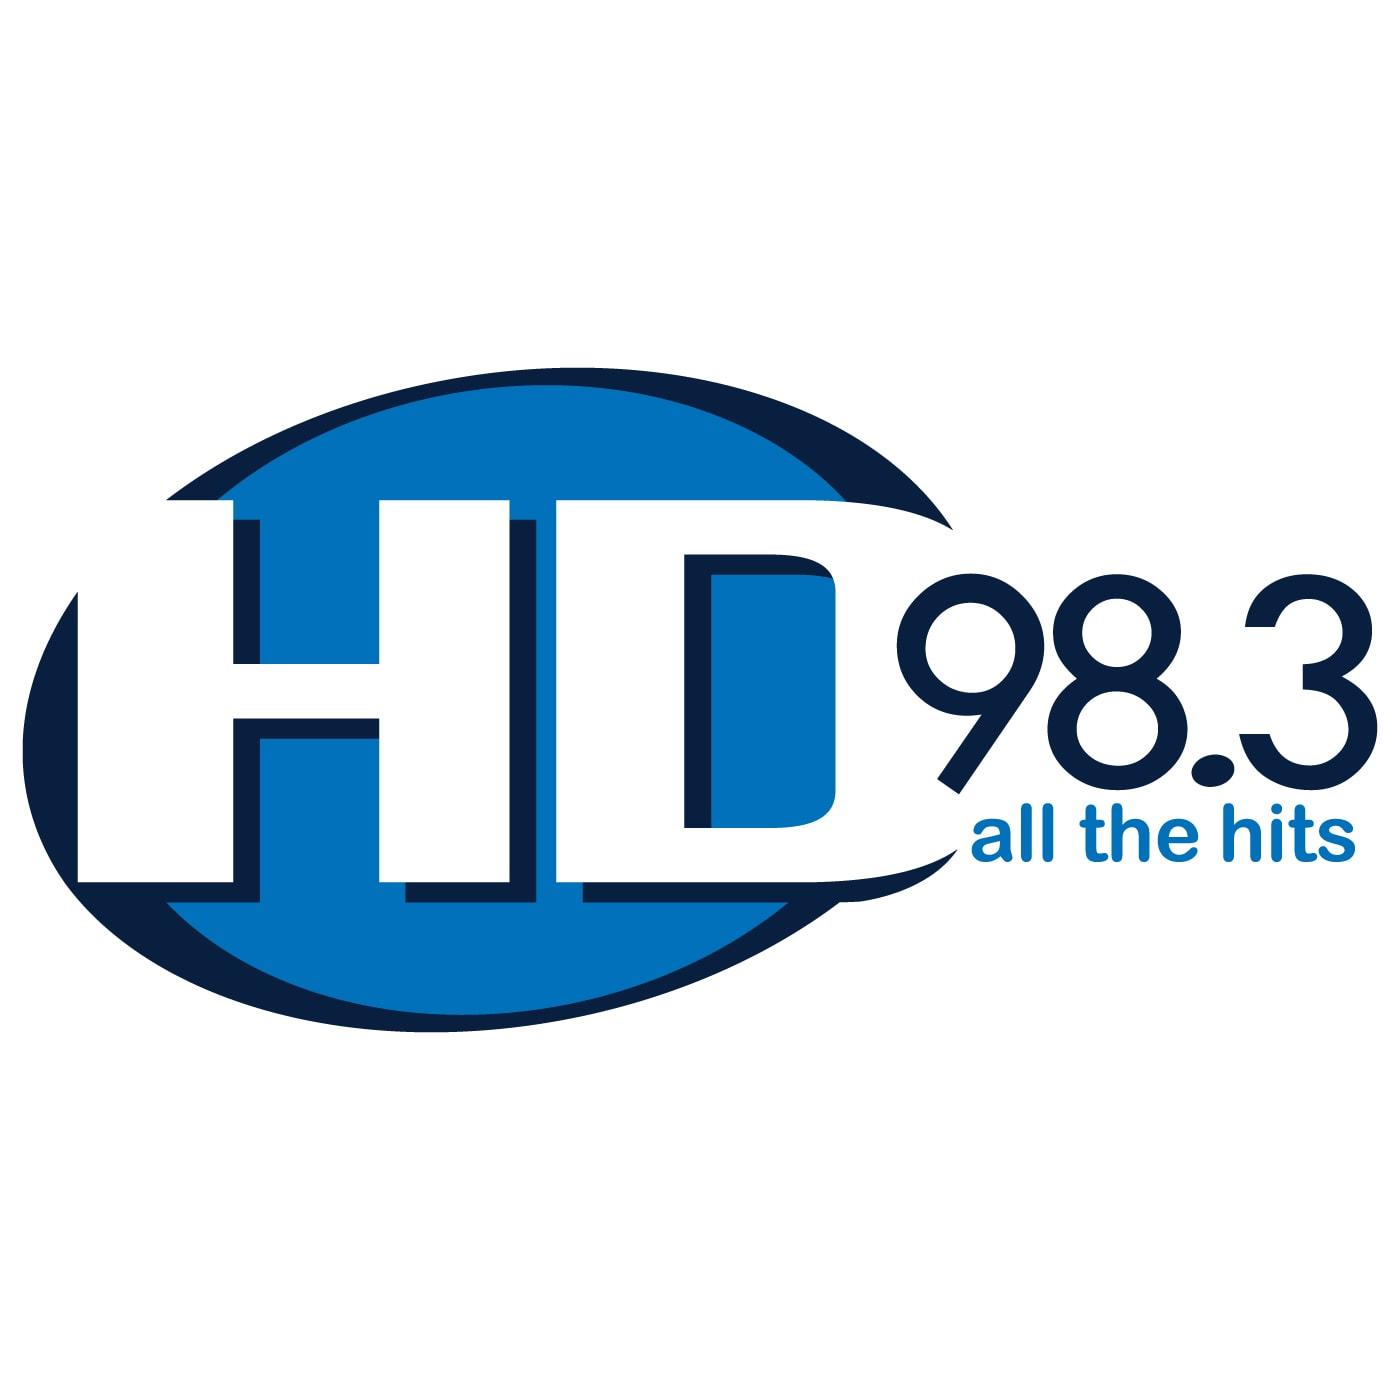 HD983 com - ALL THE HITS & THE KIDD KRADDICK MORNING SHOW